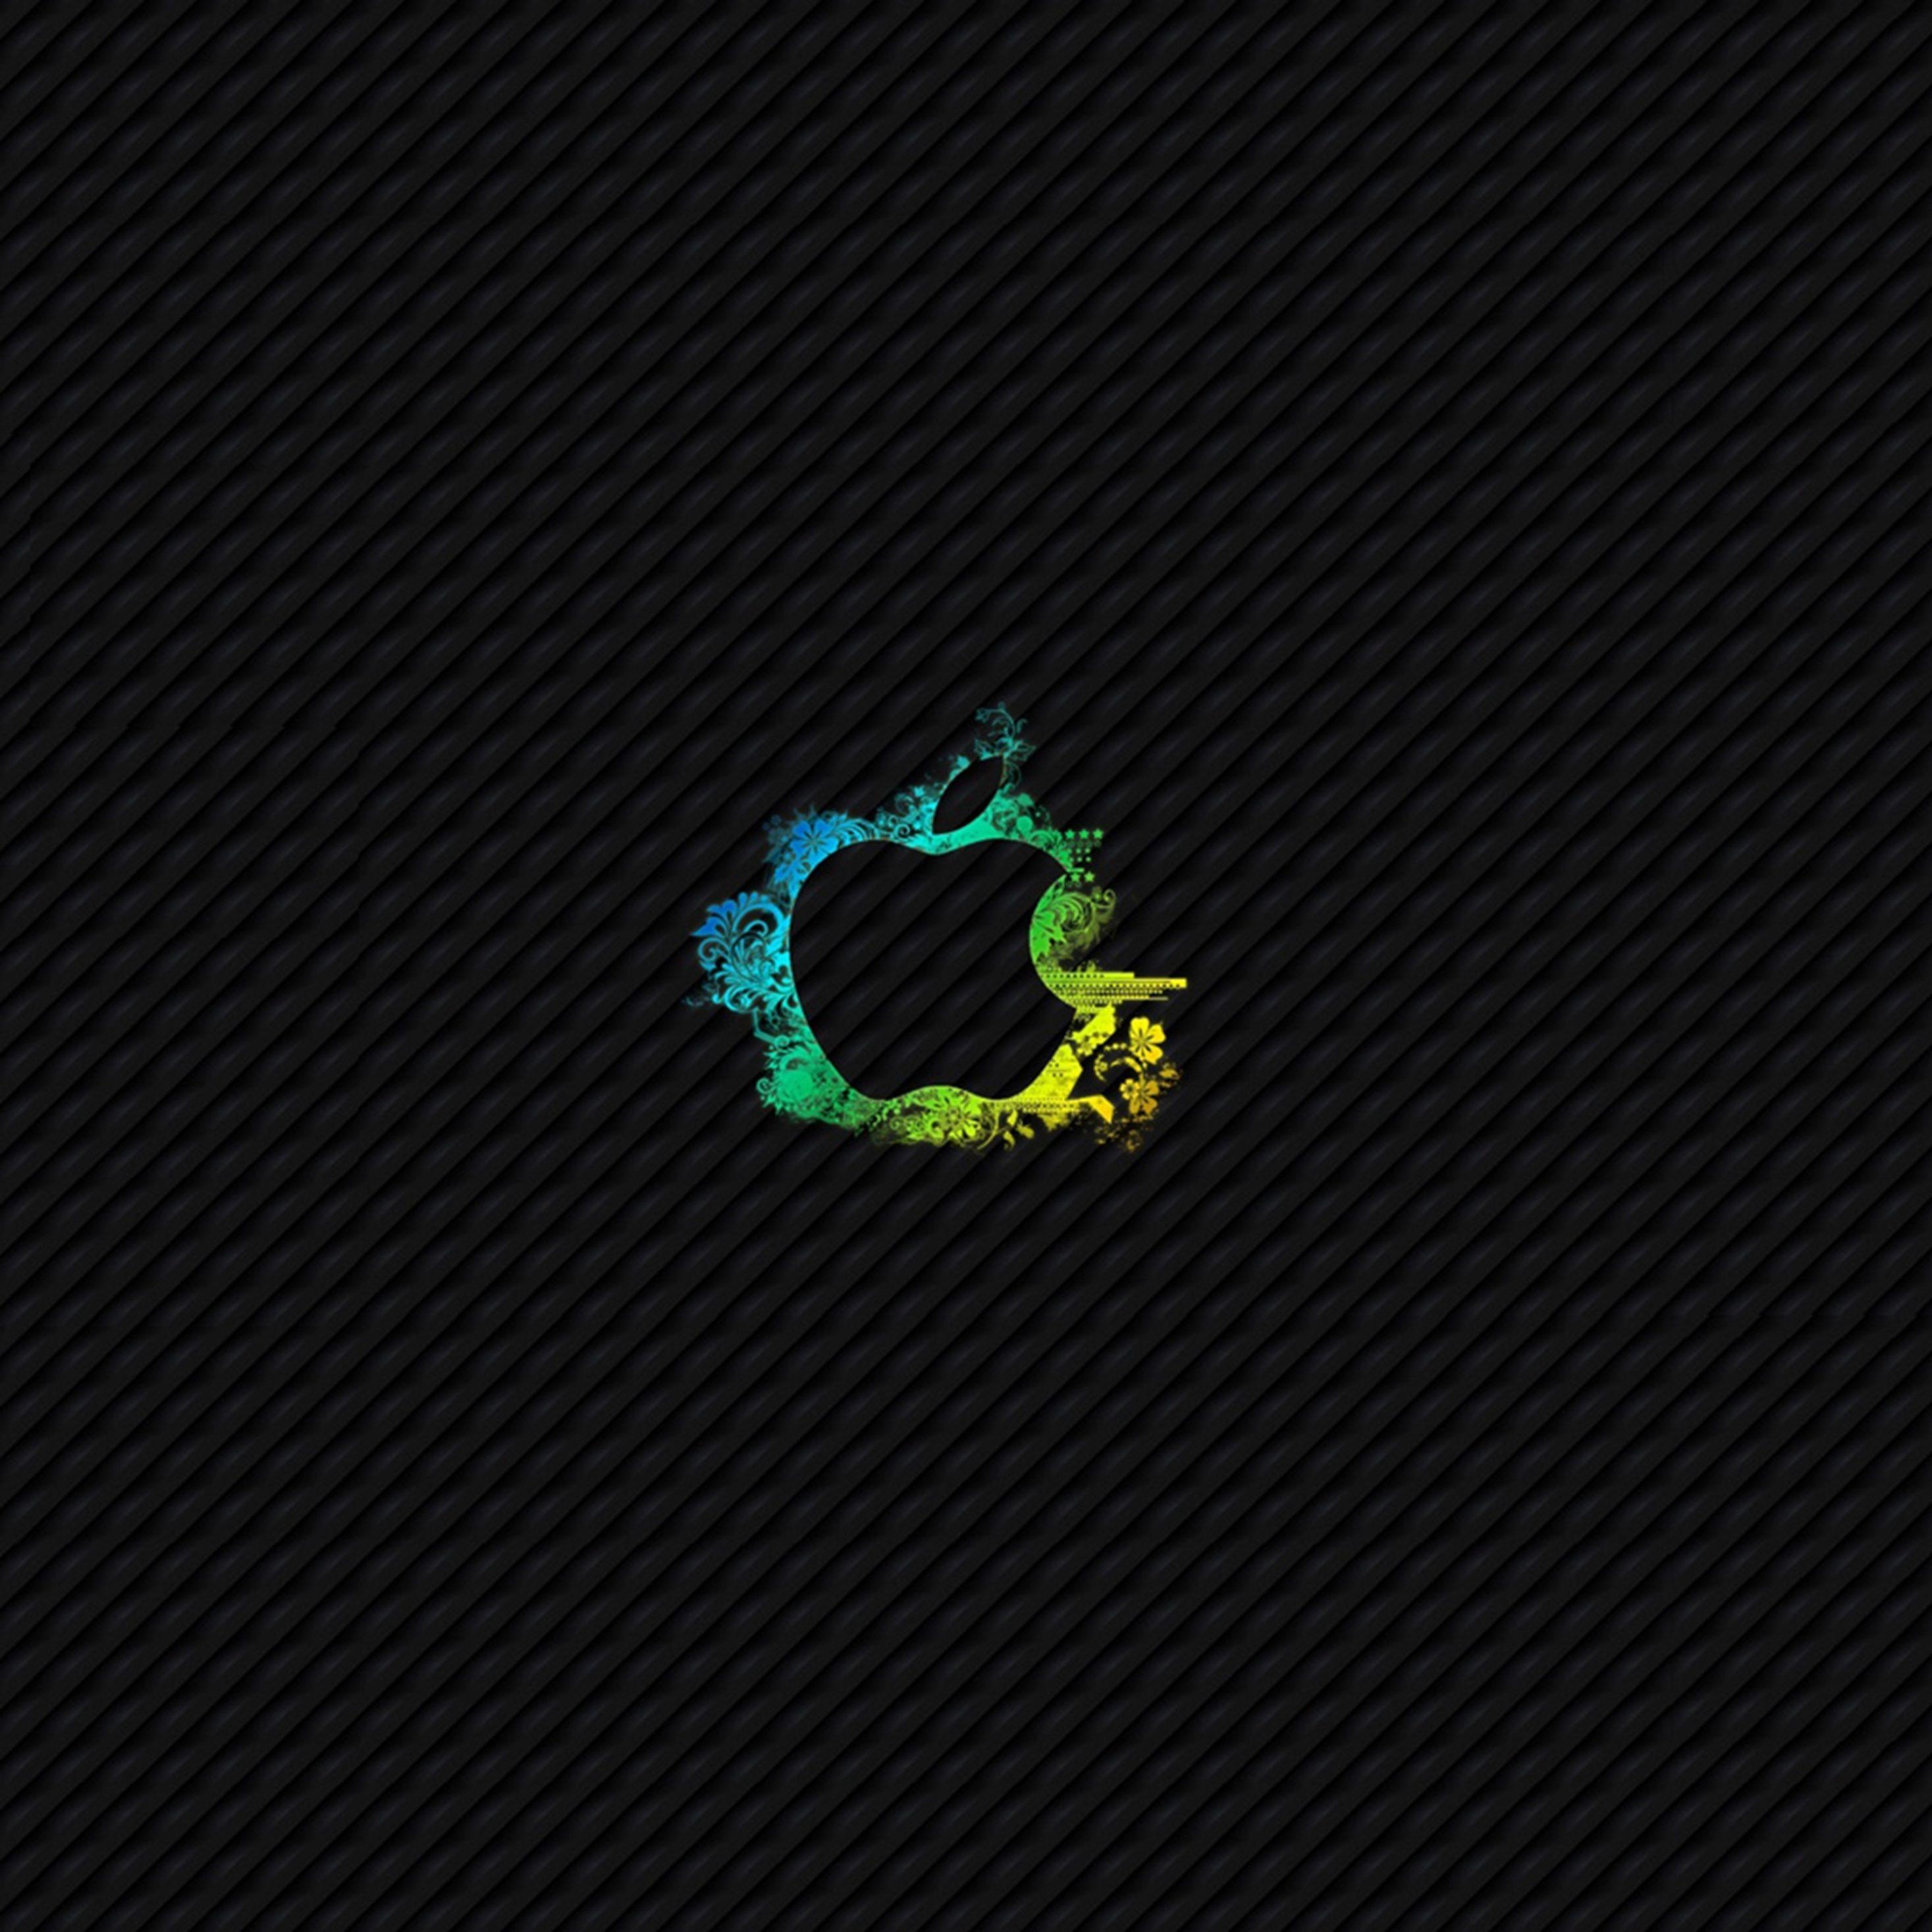 2934x2934 iOS iPad wallpaper 4k Apple Wallpaper Ipad Wallpaper 2934x2934 pixels resolution